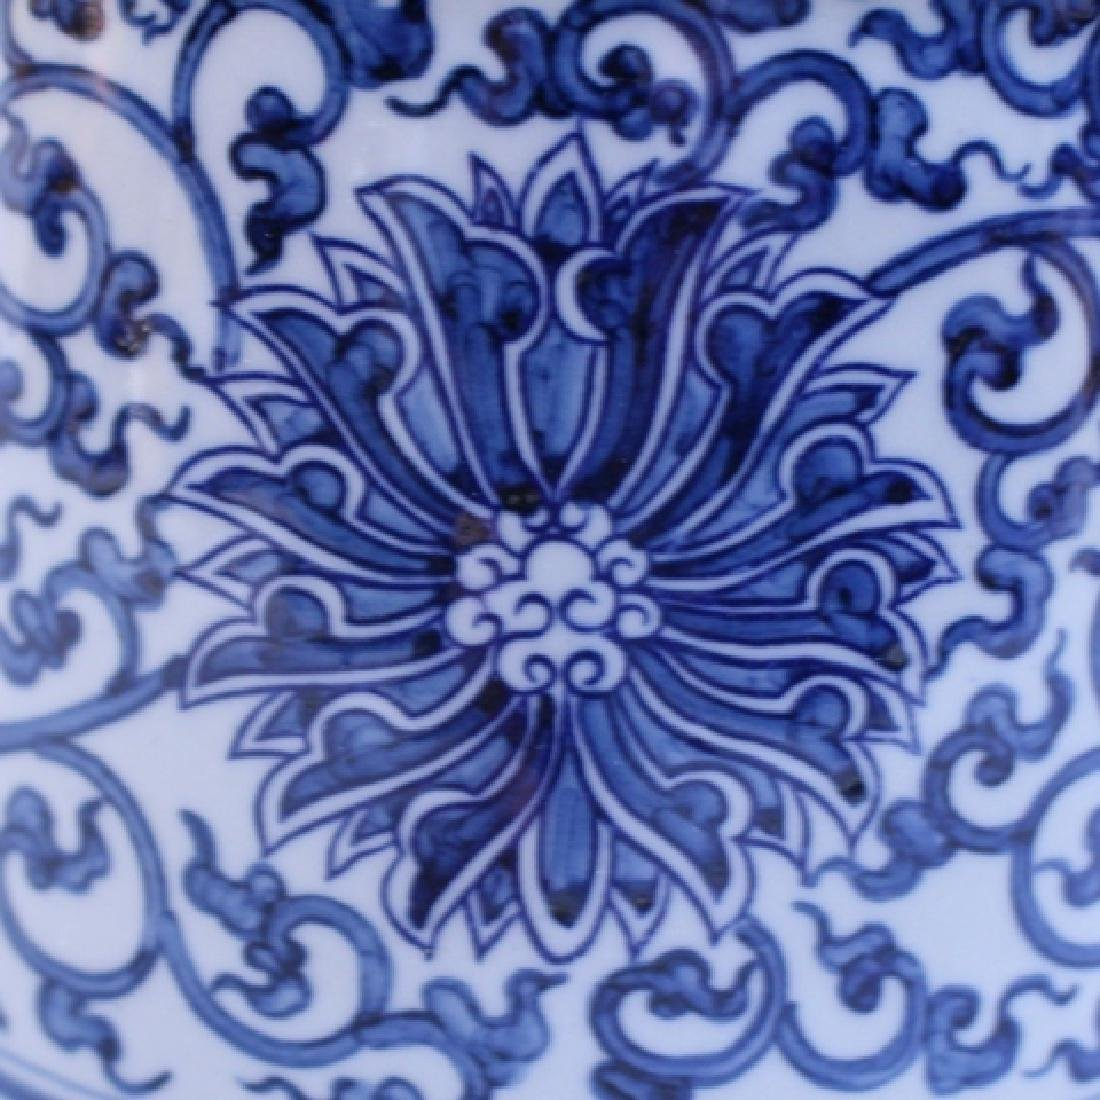 Decorative Blue and White Porcelain Gu Vase - 3